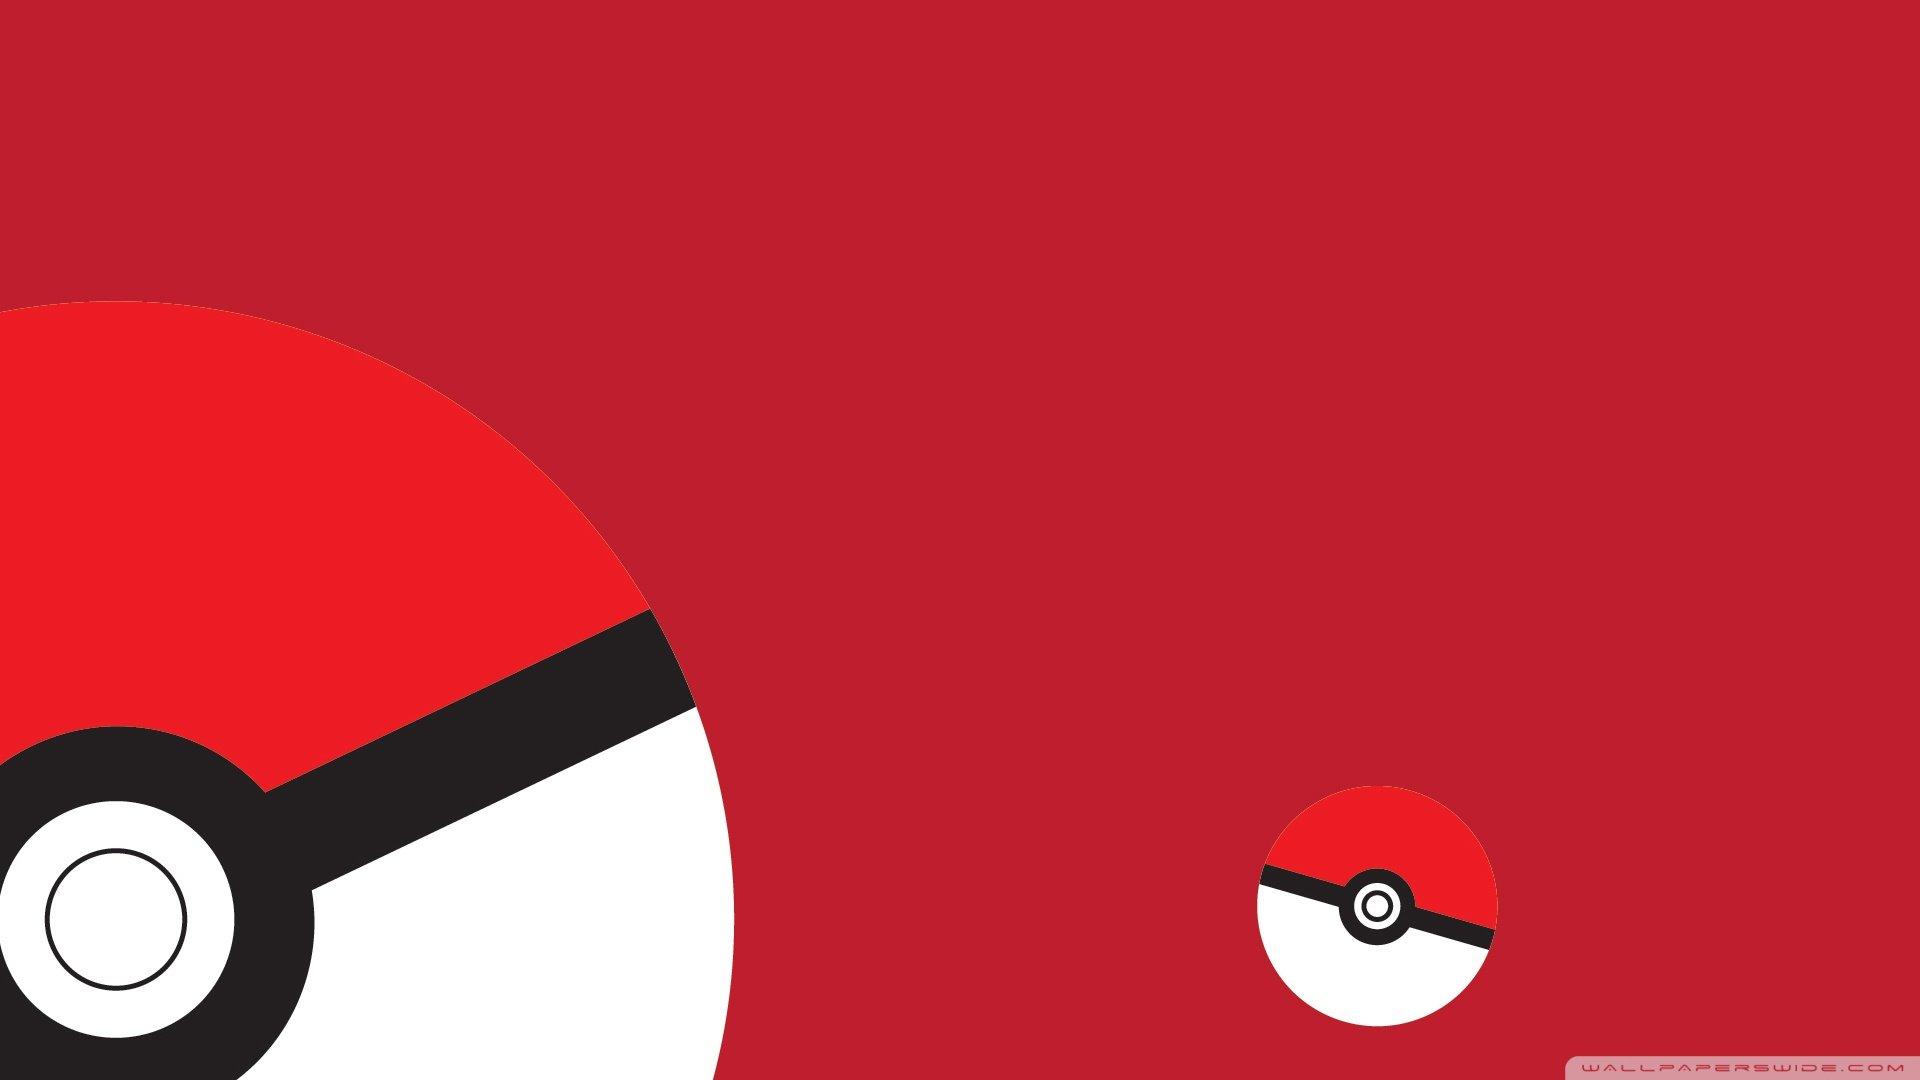 Pokemon Background Pokeball wallpaper   932274 1920x1080